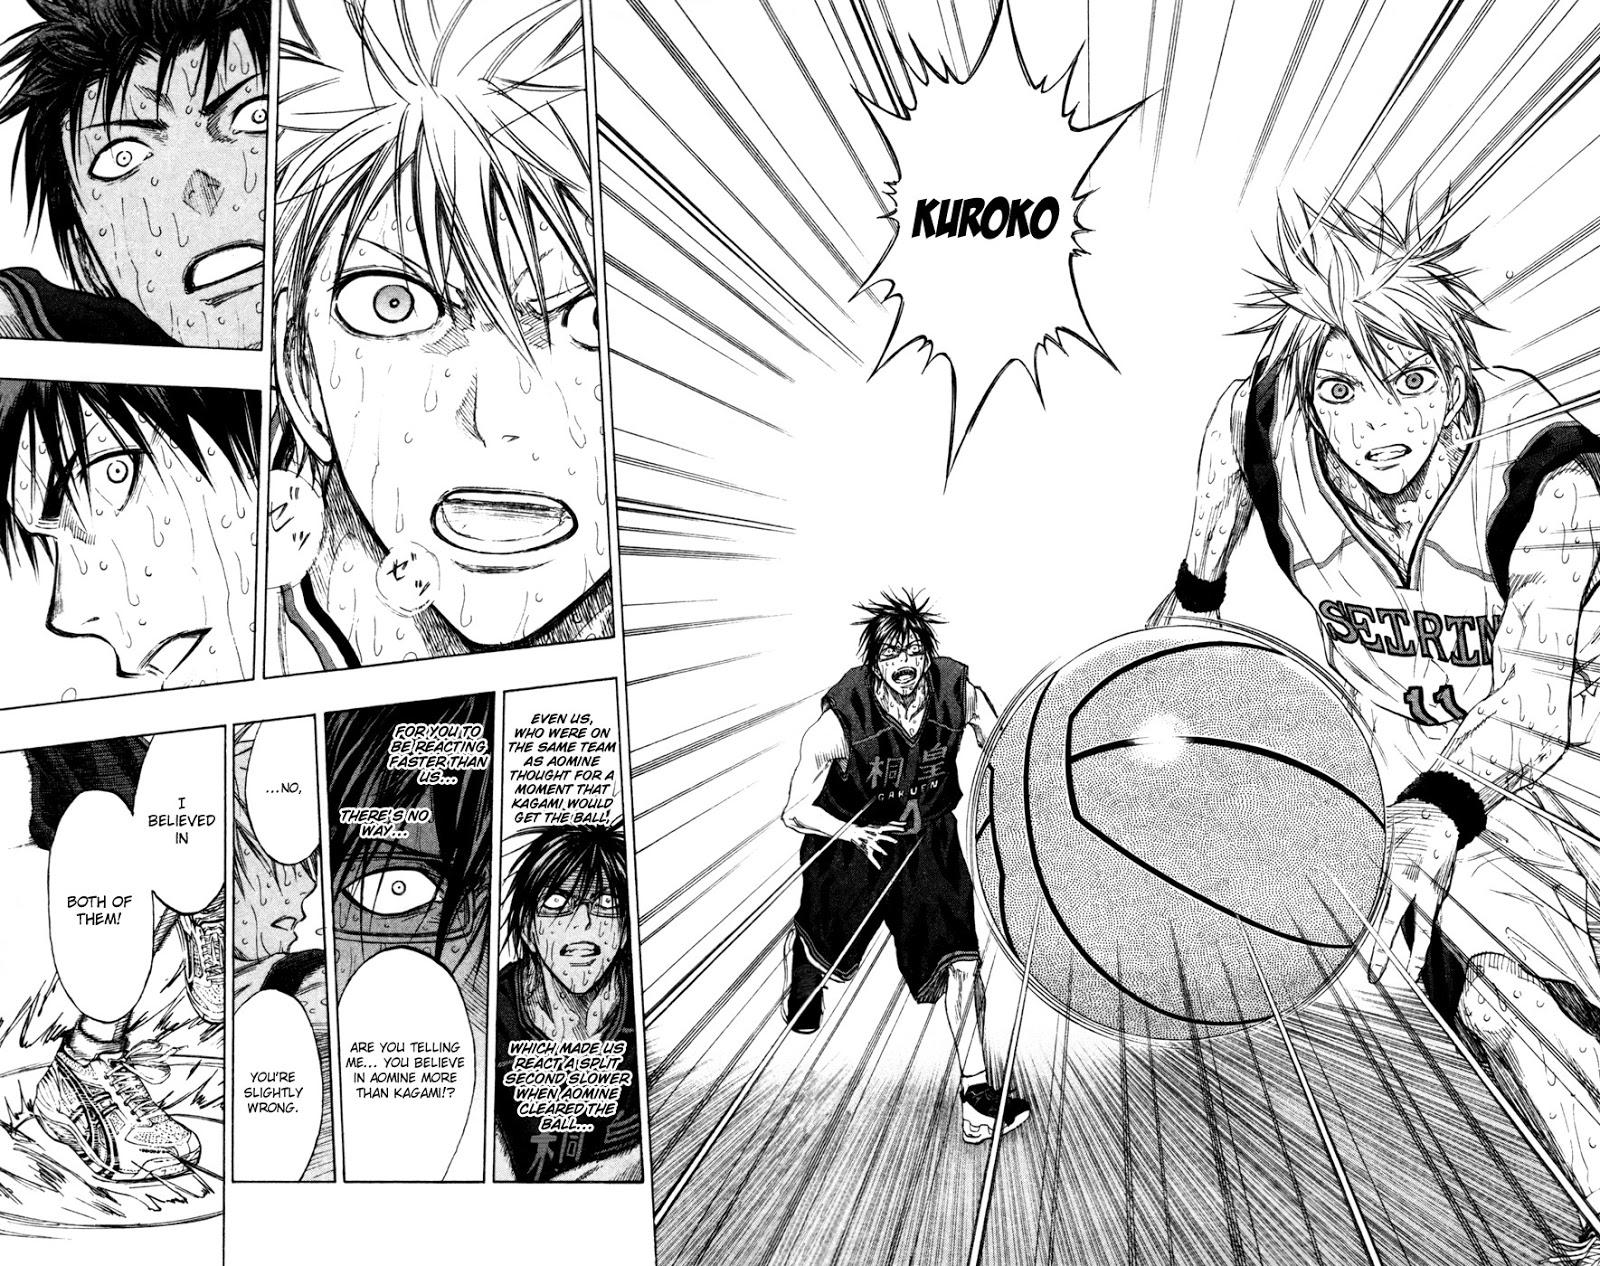 Kuroko no Basket Manga Chapter 138 - Image 16-17